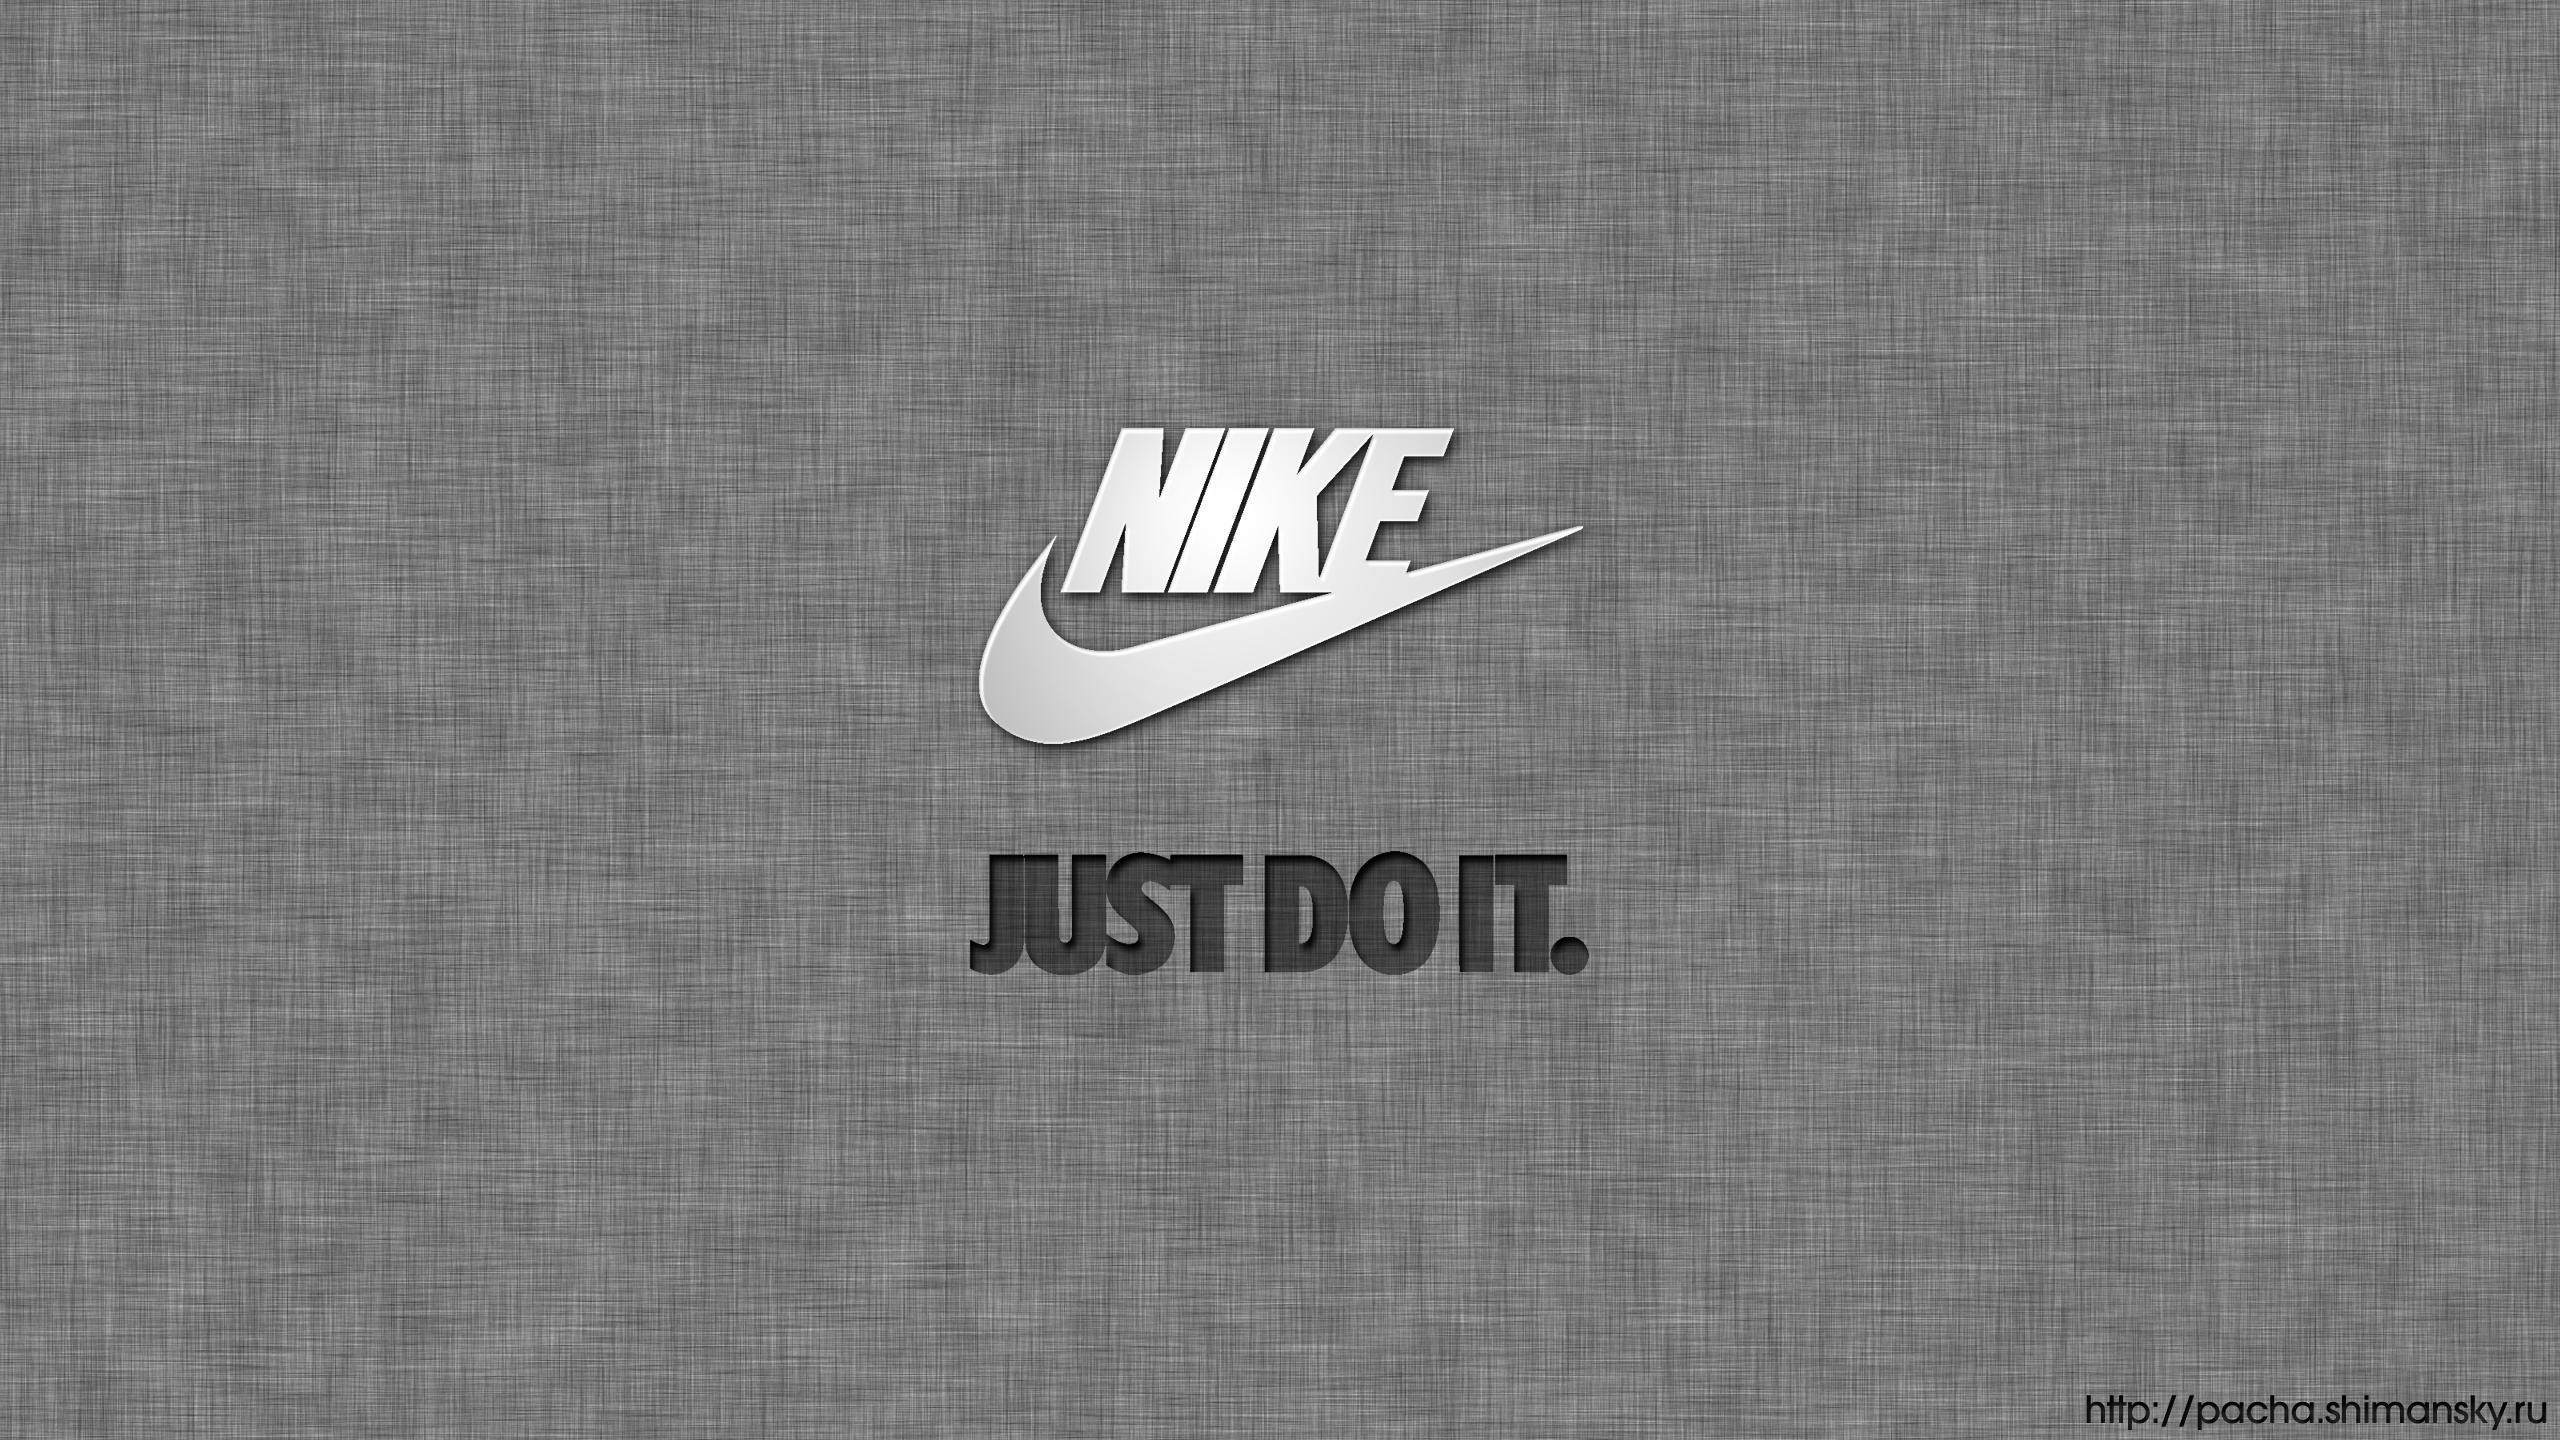 Wallpaper Nike 2018 59 Images